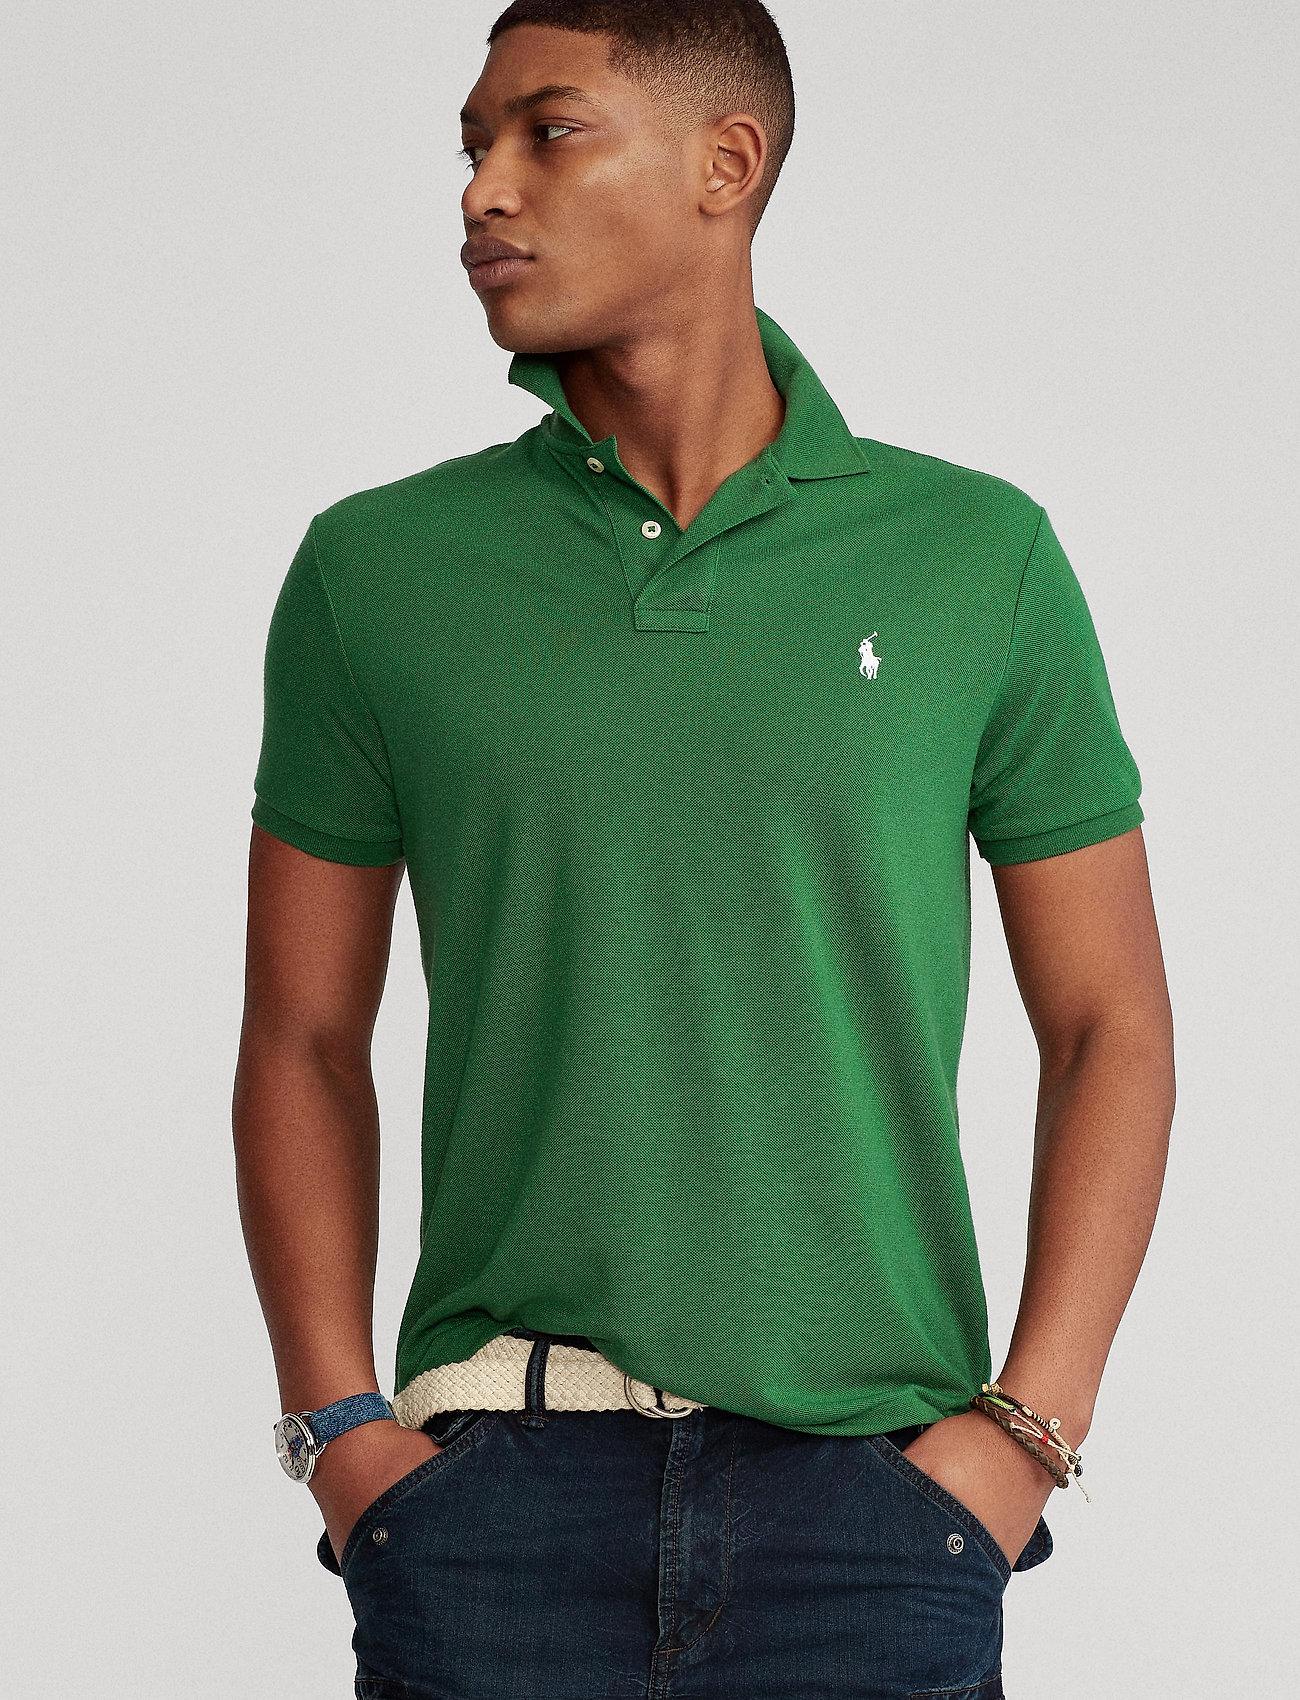 Polo Ralph Lauren - The Earth Polo - kurzärmelig - stuart green - 0